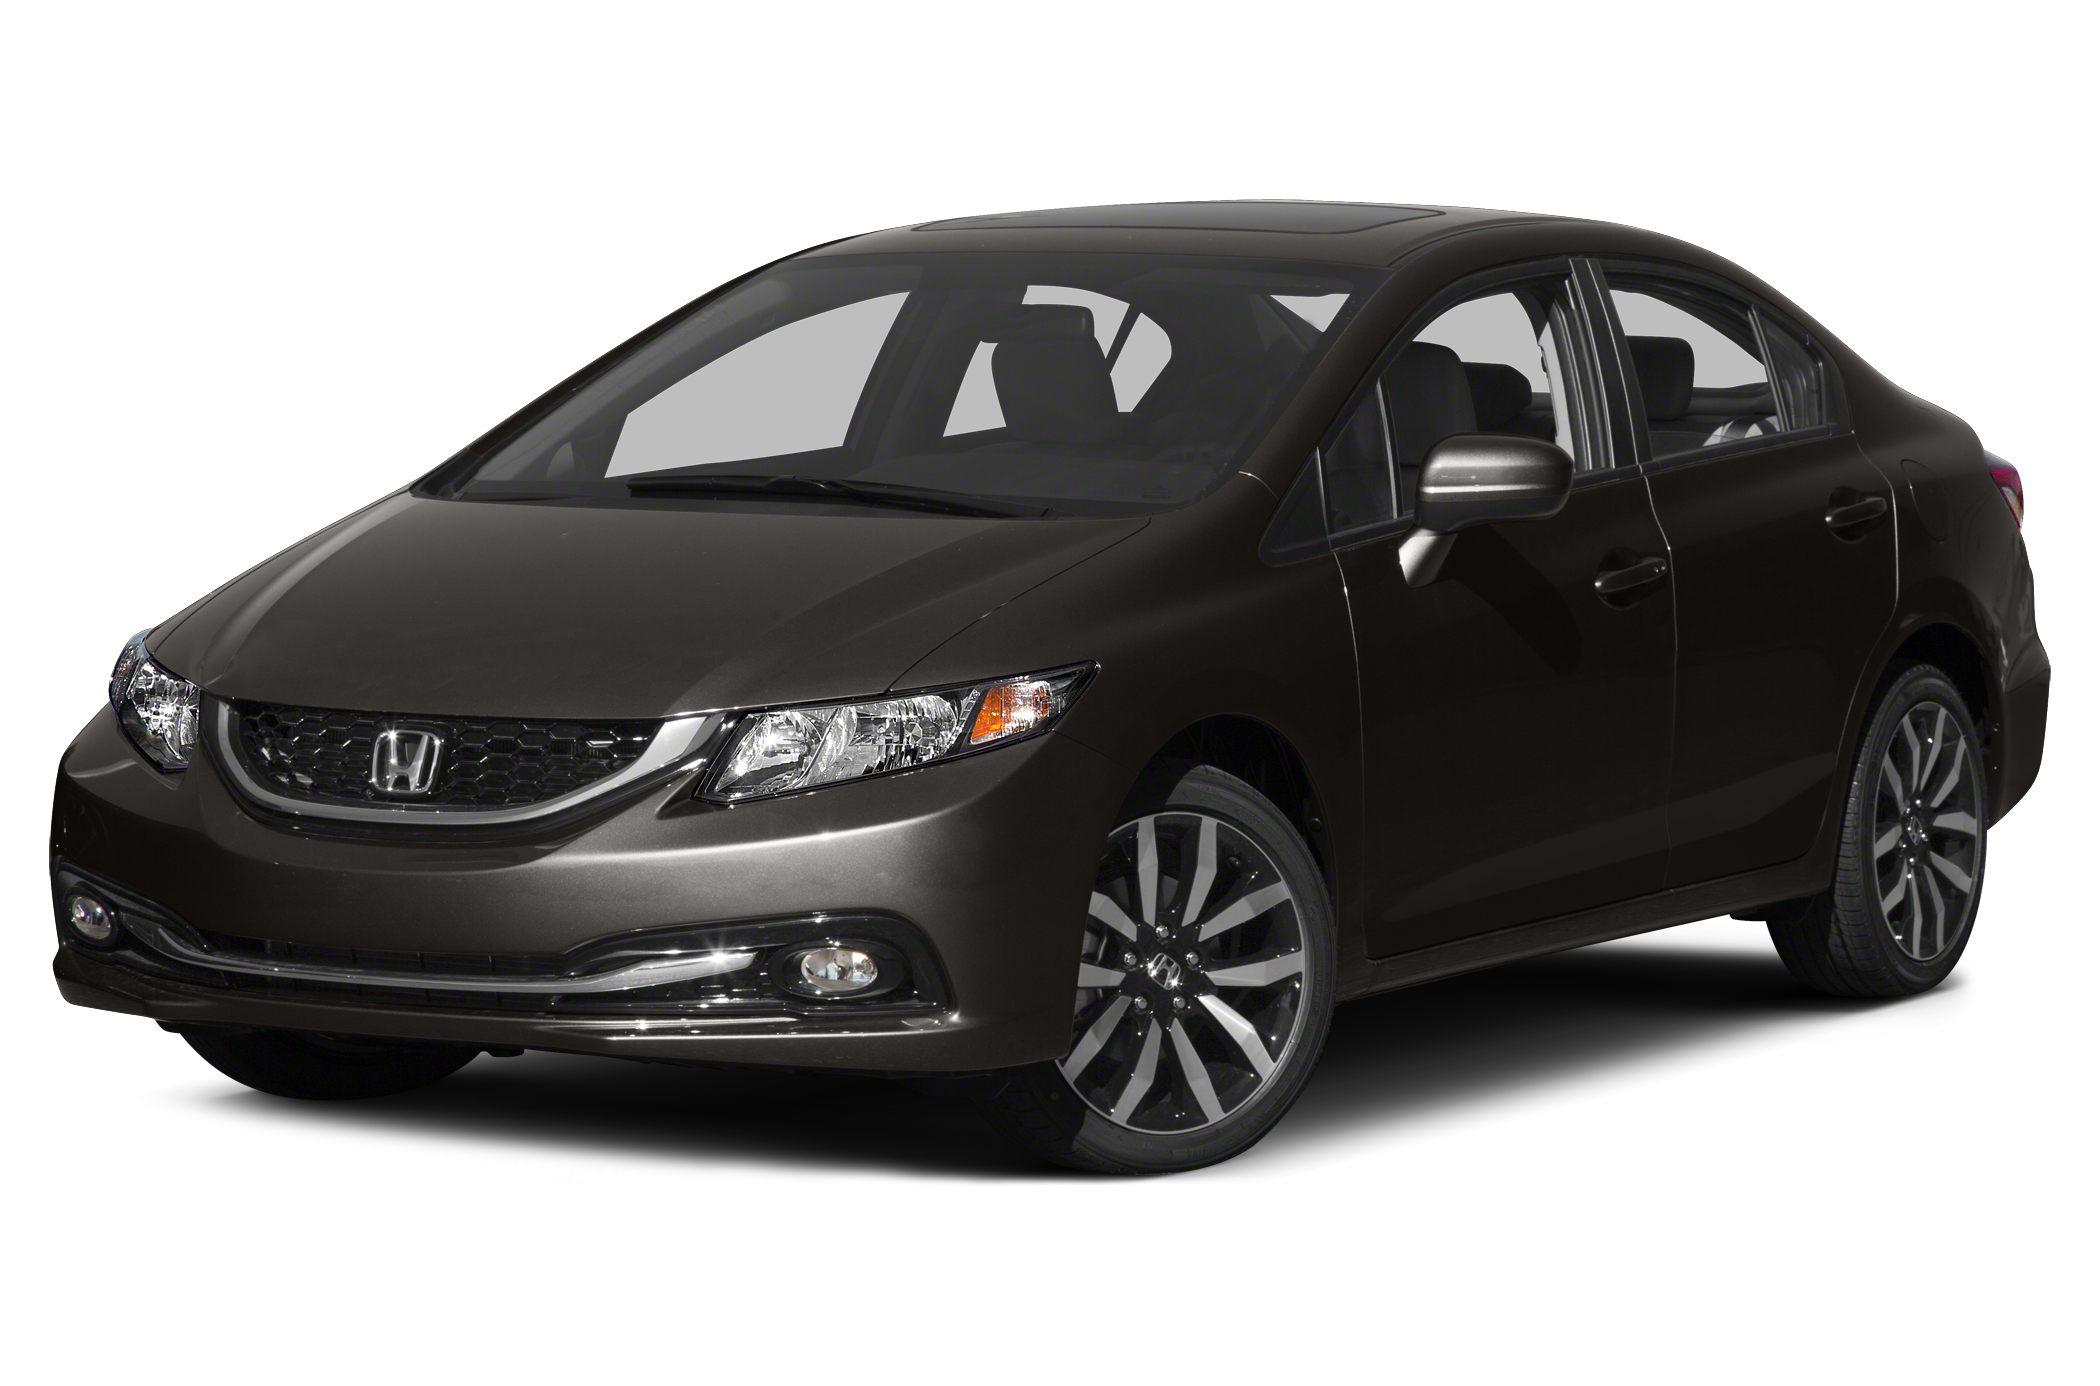 2015 Honda Civic EX-L Miles 22769Stock t9249 VIN 19XFB2F90FE213679